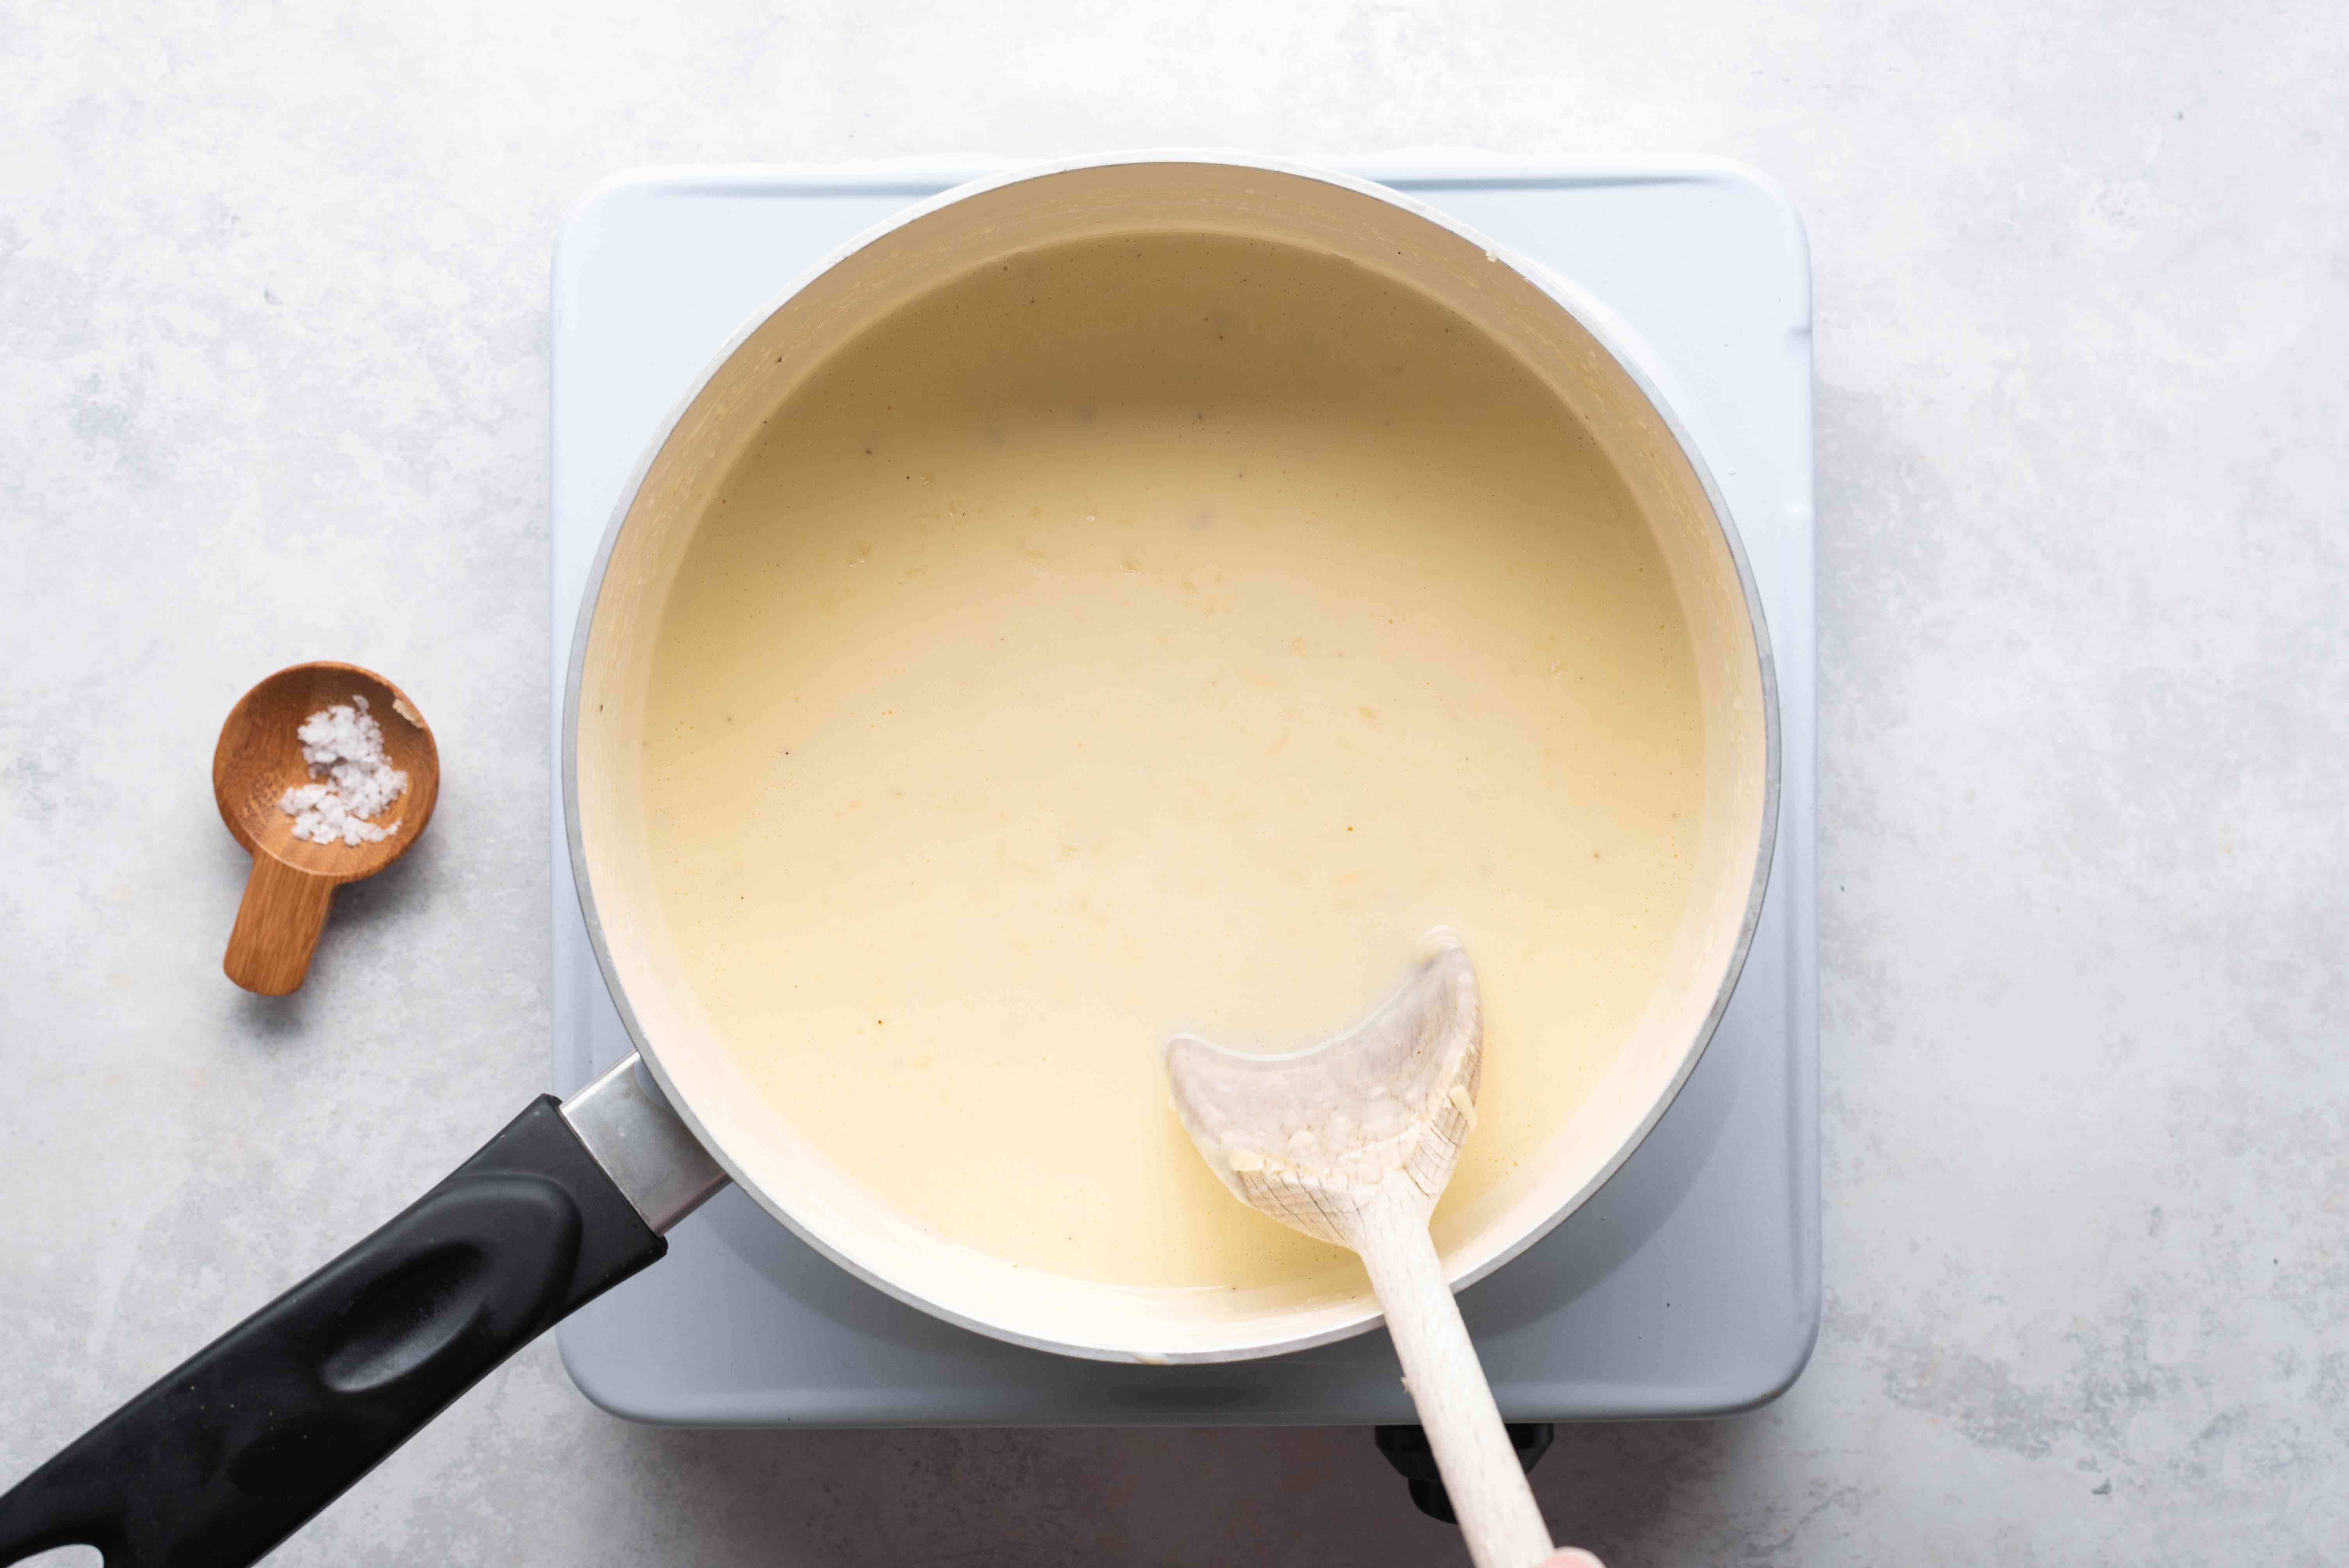 cheese sauce in the saucepan